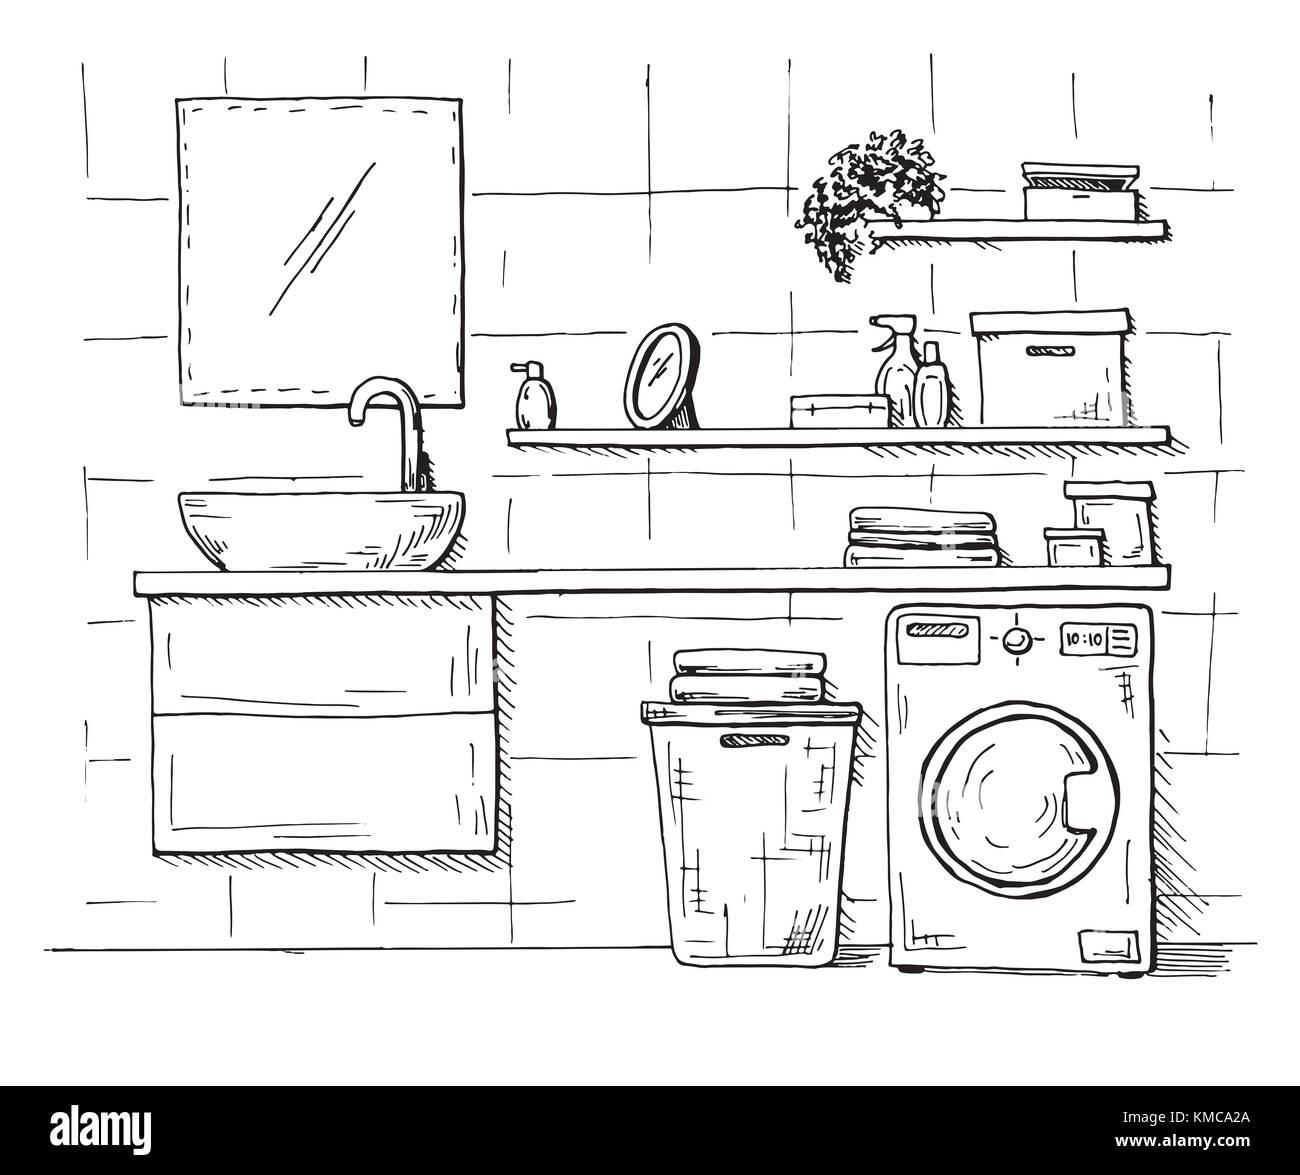 Bathroom Sketch Stock Photos Bathroom Sketch Stock Images Alamy - Drawing of bathroom